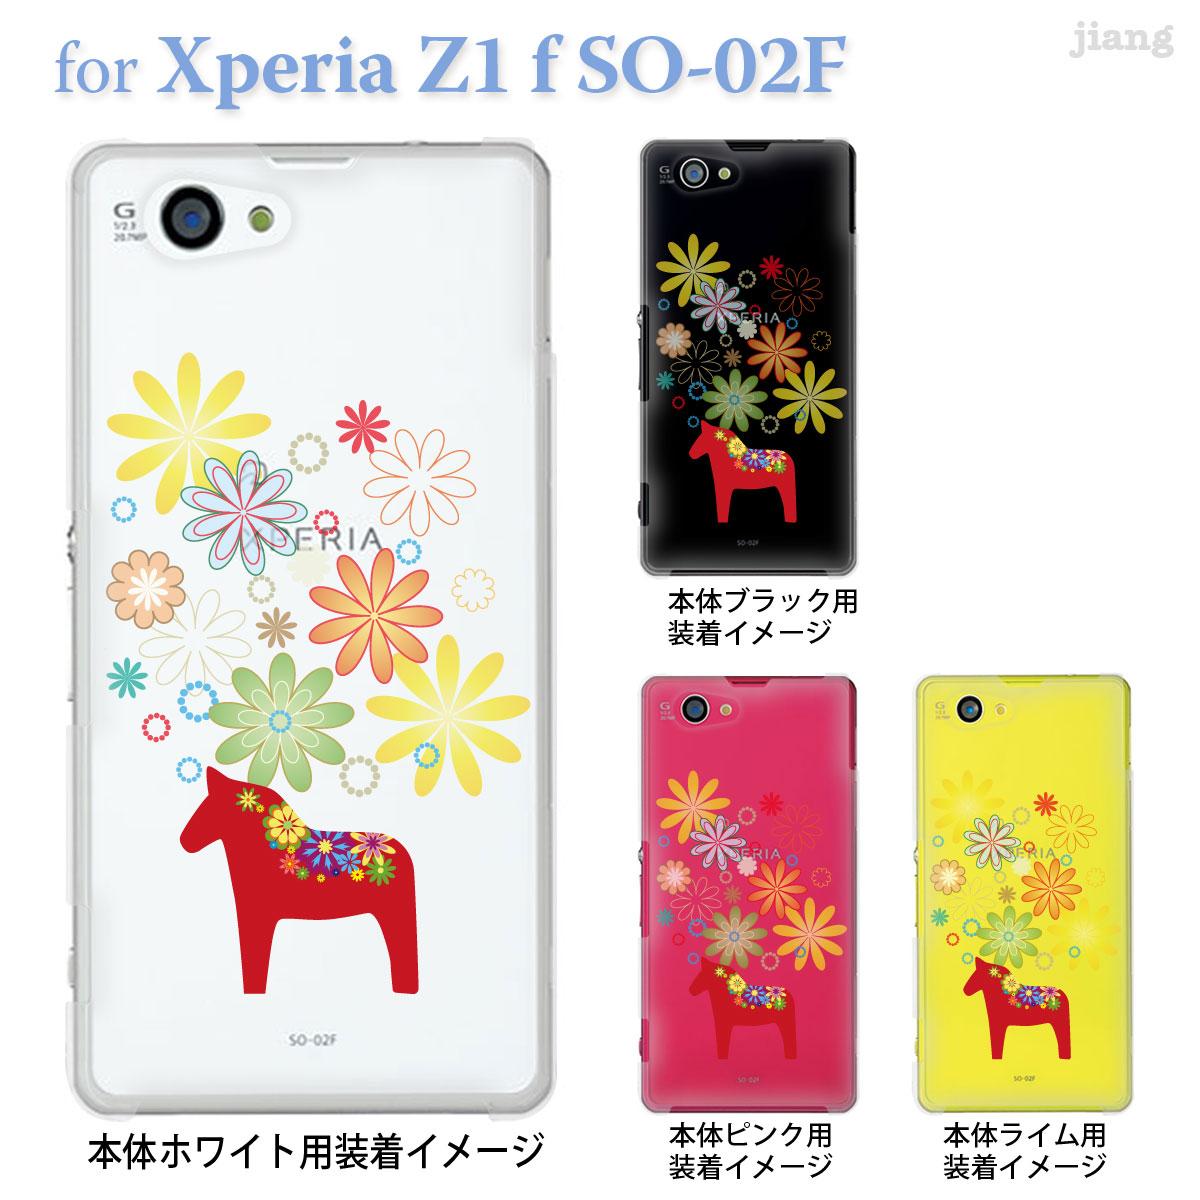 �ڳ�ŷ�Ծ�ۡ�Xperia Z1 f  SO-02F �ۡ�SO-02F �������ۡڥ��С��ۡڥ��ޥۥ������ۡڥ��ꥢ�������ۡڥե��ۡ�Vuodenaika�ۡ��̲��ۡڥ�����ʥۡ����ۡ�21-so02f-ne0052��TK-JIANG